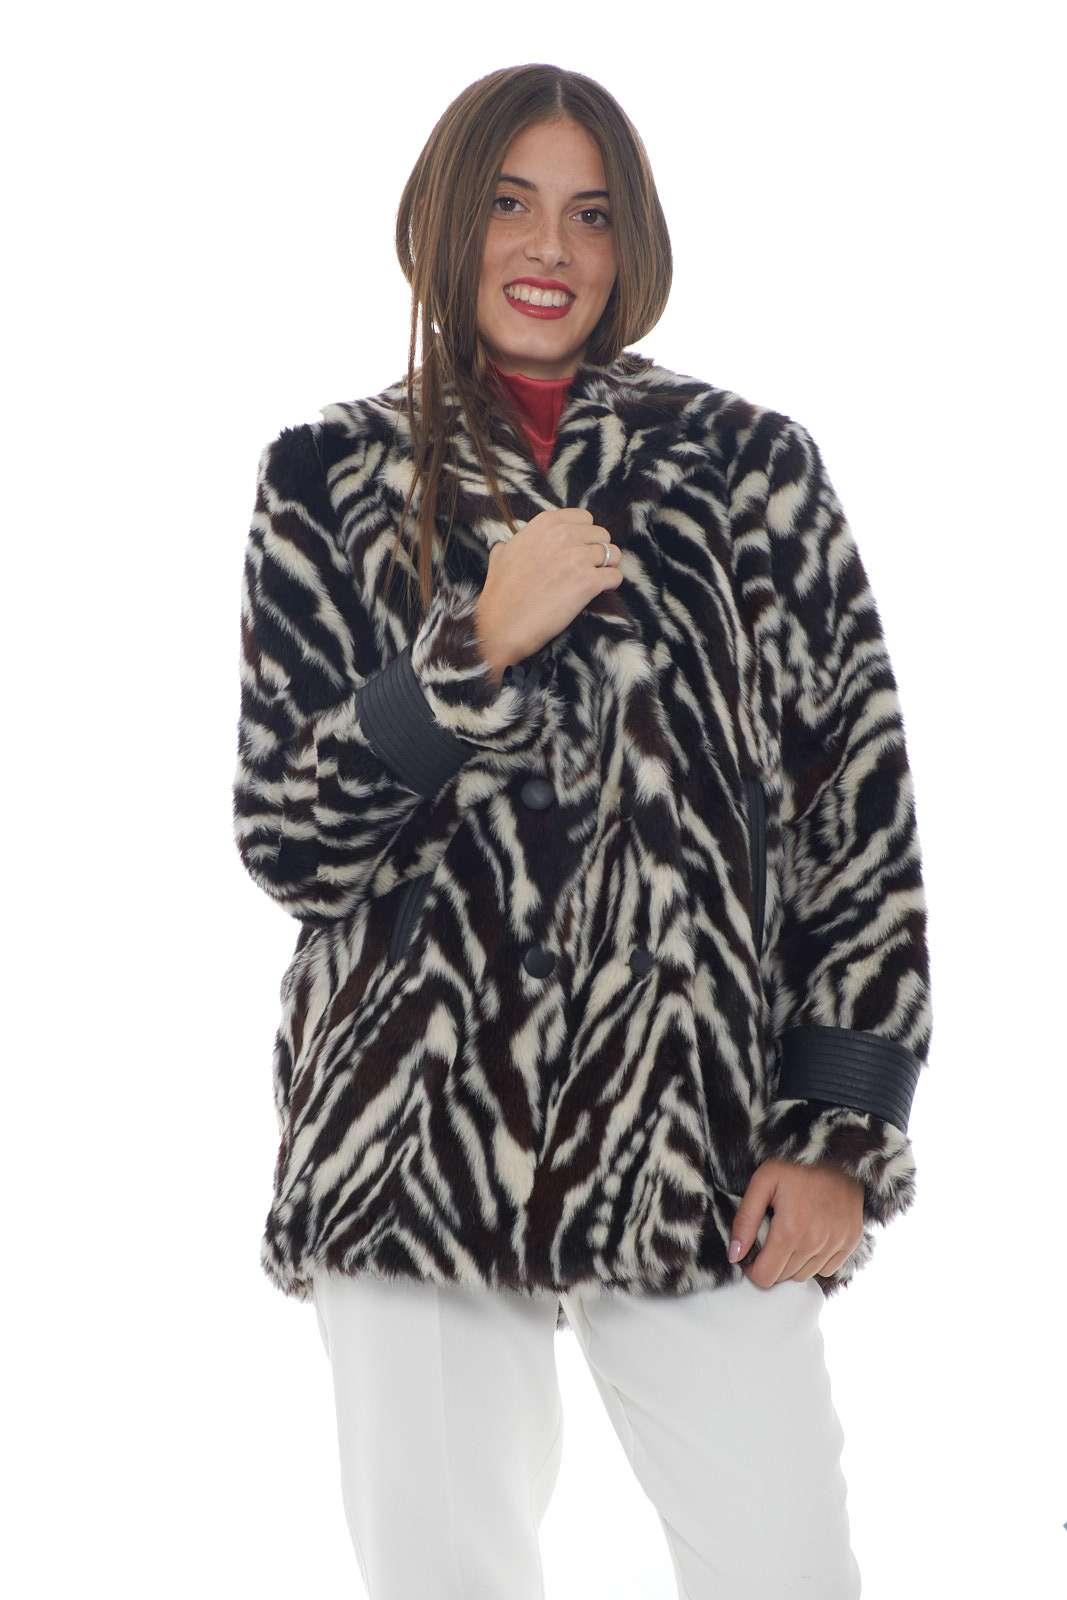 https://www.parmax.com/media/catalog/product/a/i/AI-outlet_parmax-pelliccia-donna-Pinko-1g146m-A.jpg